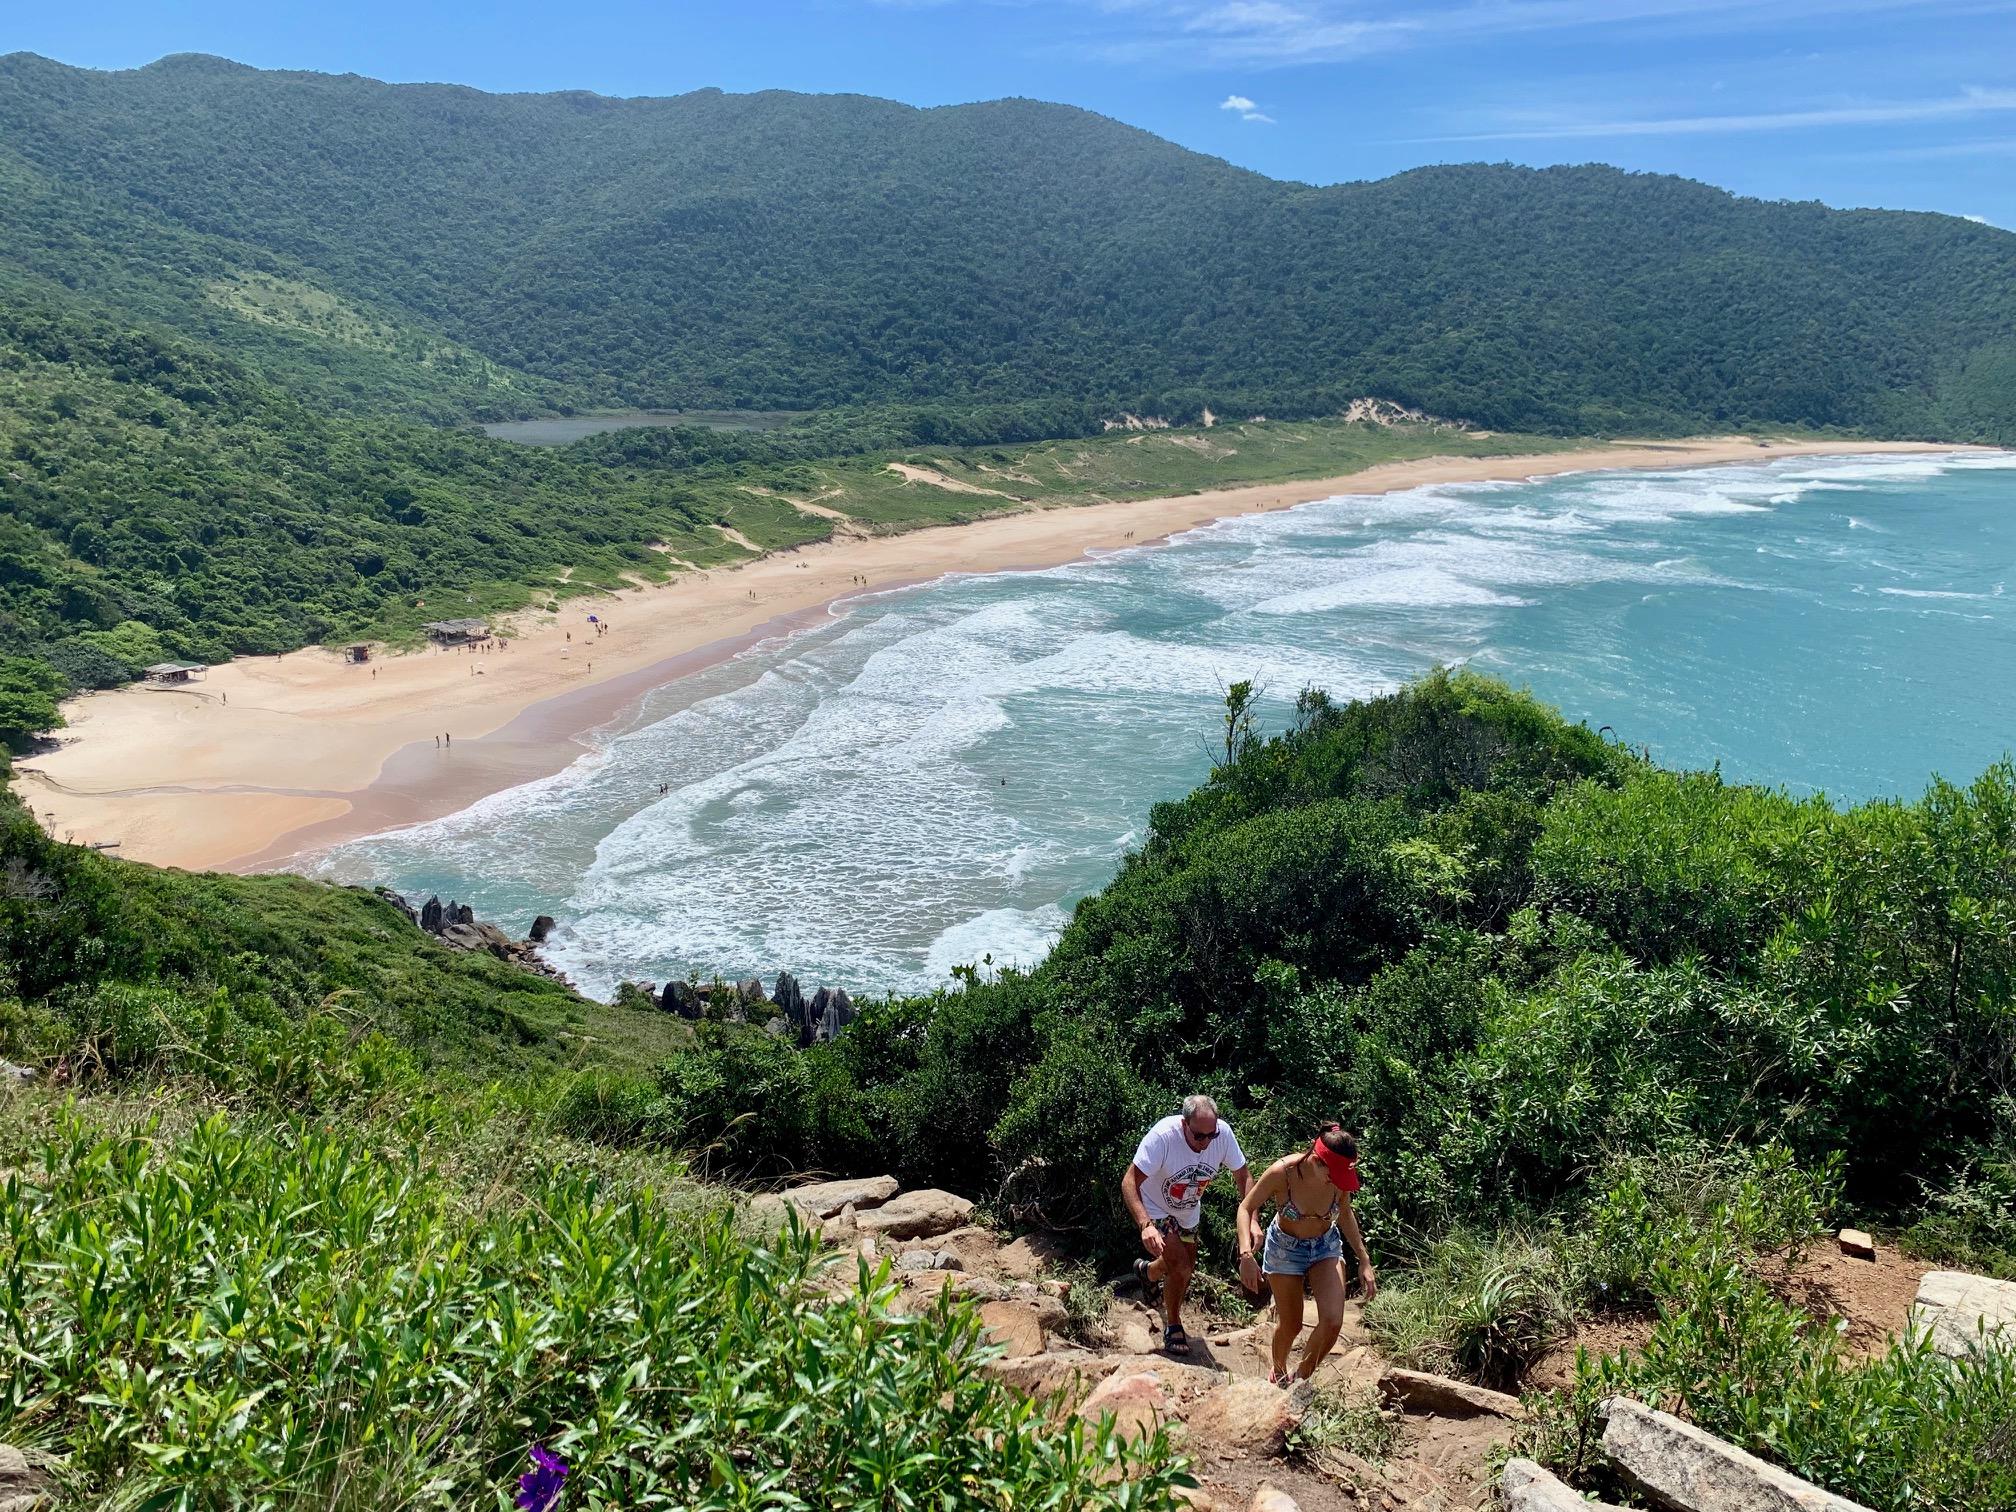 Qué hacer en Florianópolis (Brasil)